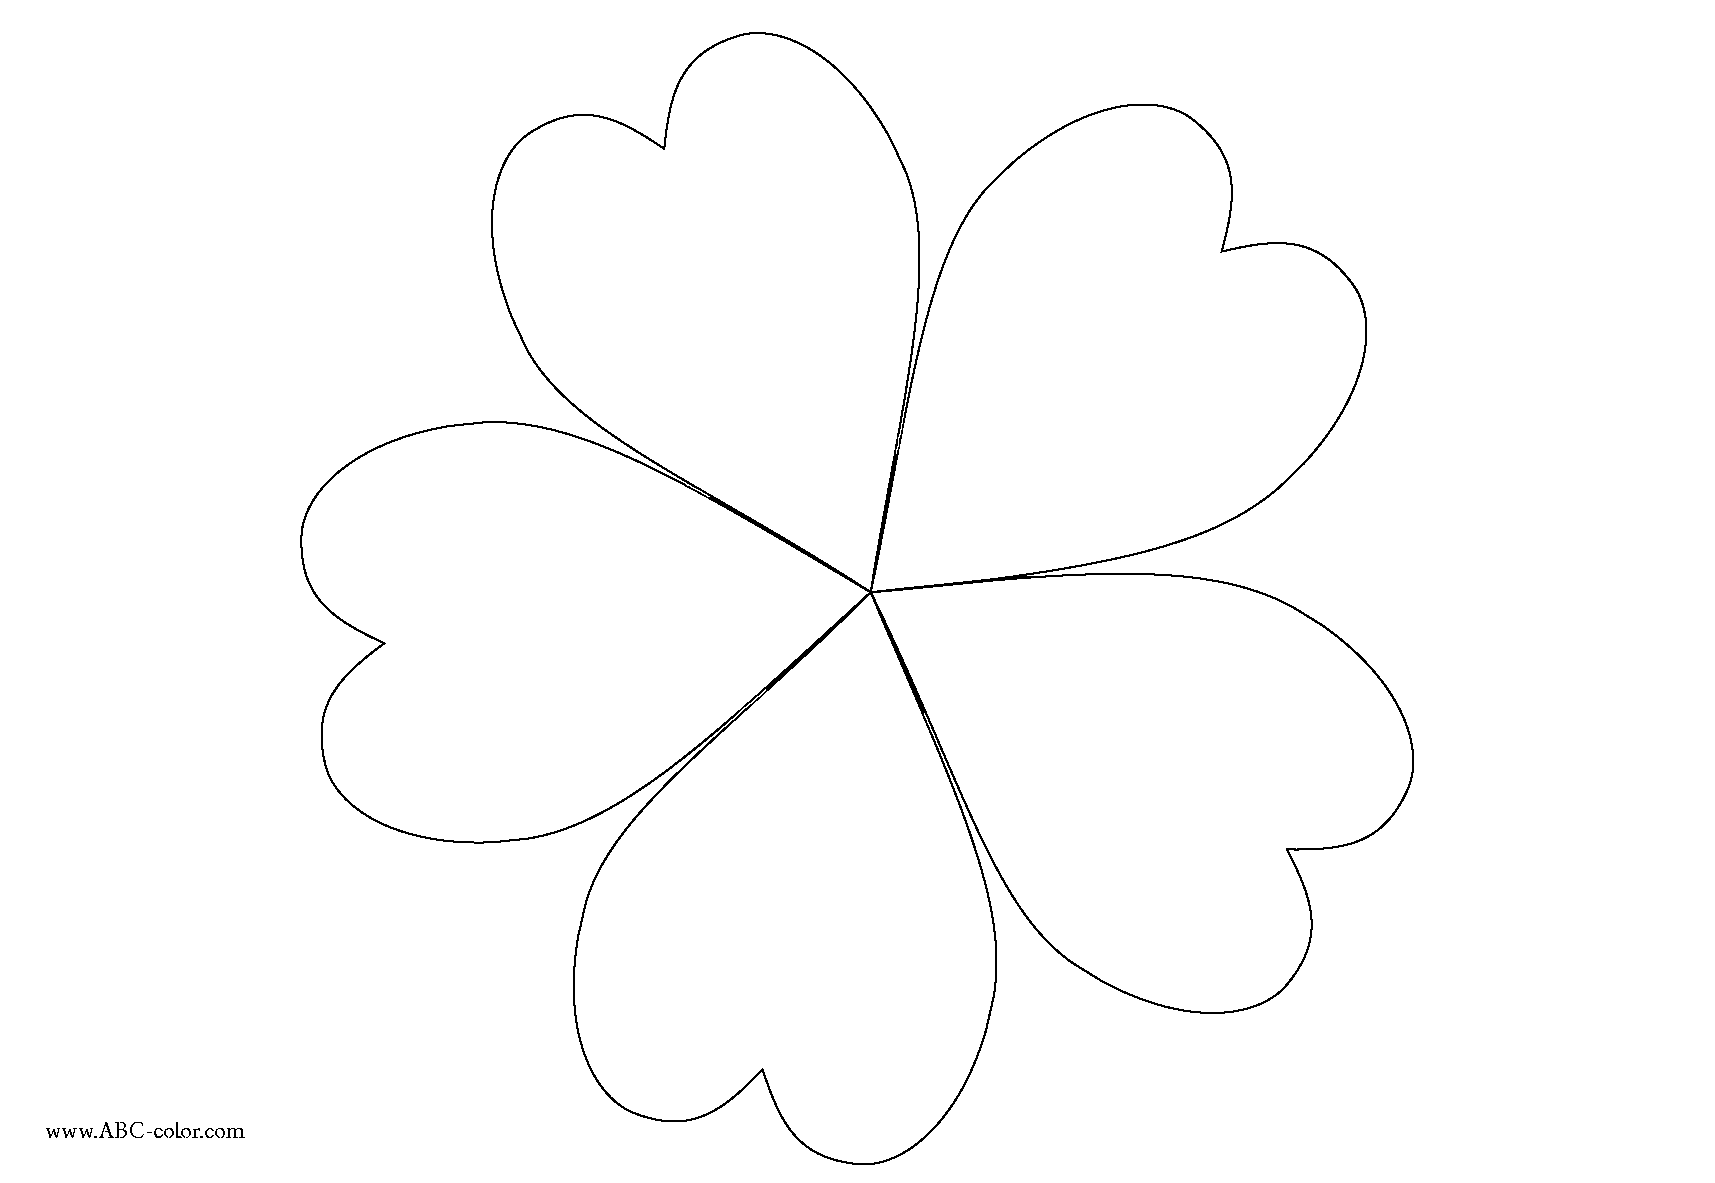 Flower Petals Line Drawing : Petal flower templates clipart best